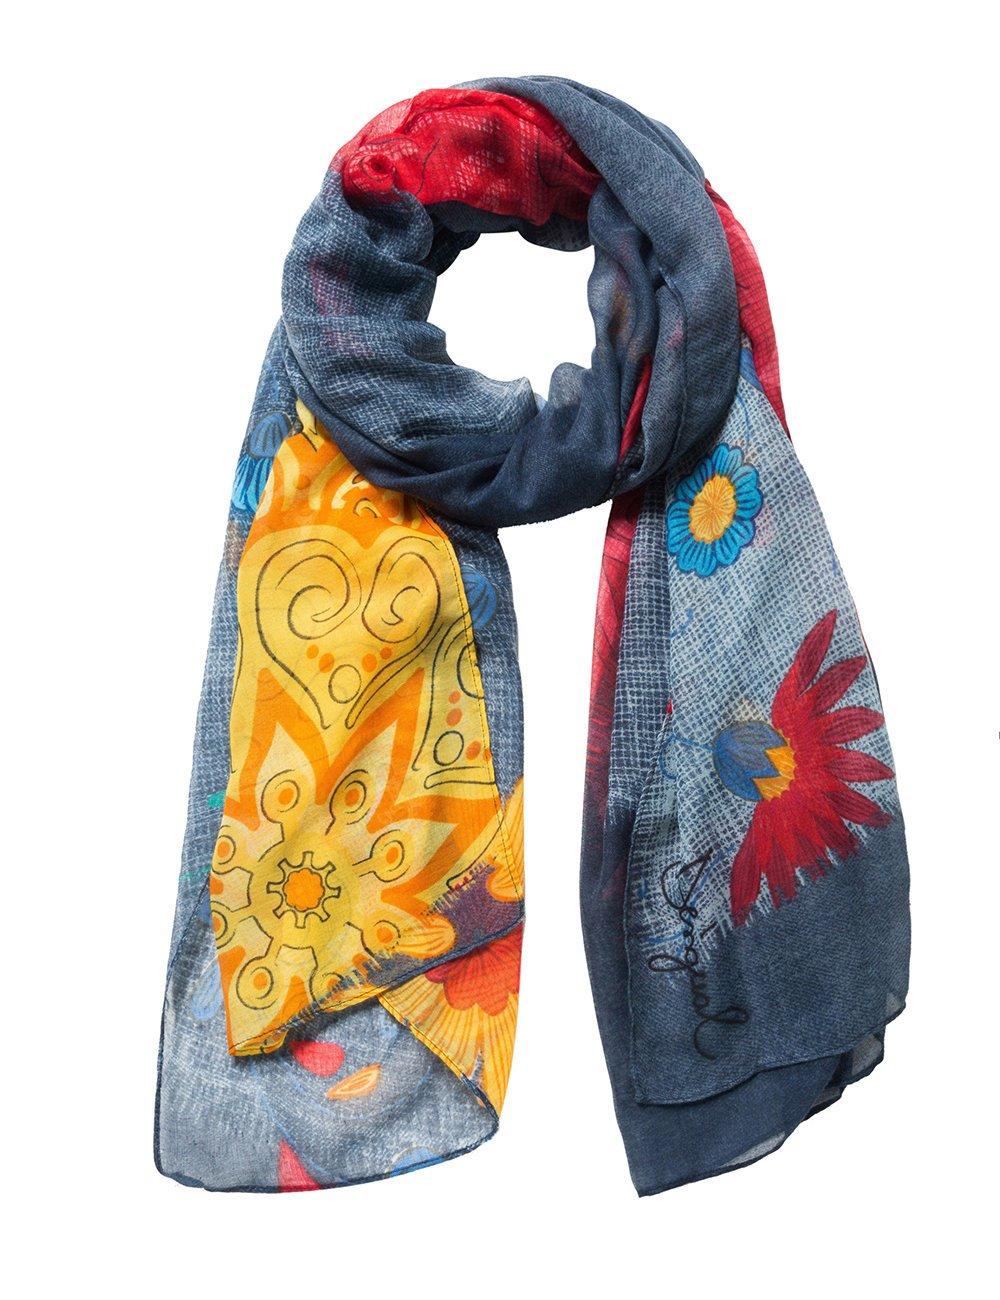 bfade97deb4 Desigual foulards 18waww37 gloria rectangle bleu product image